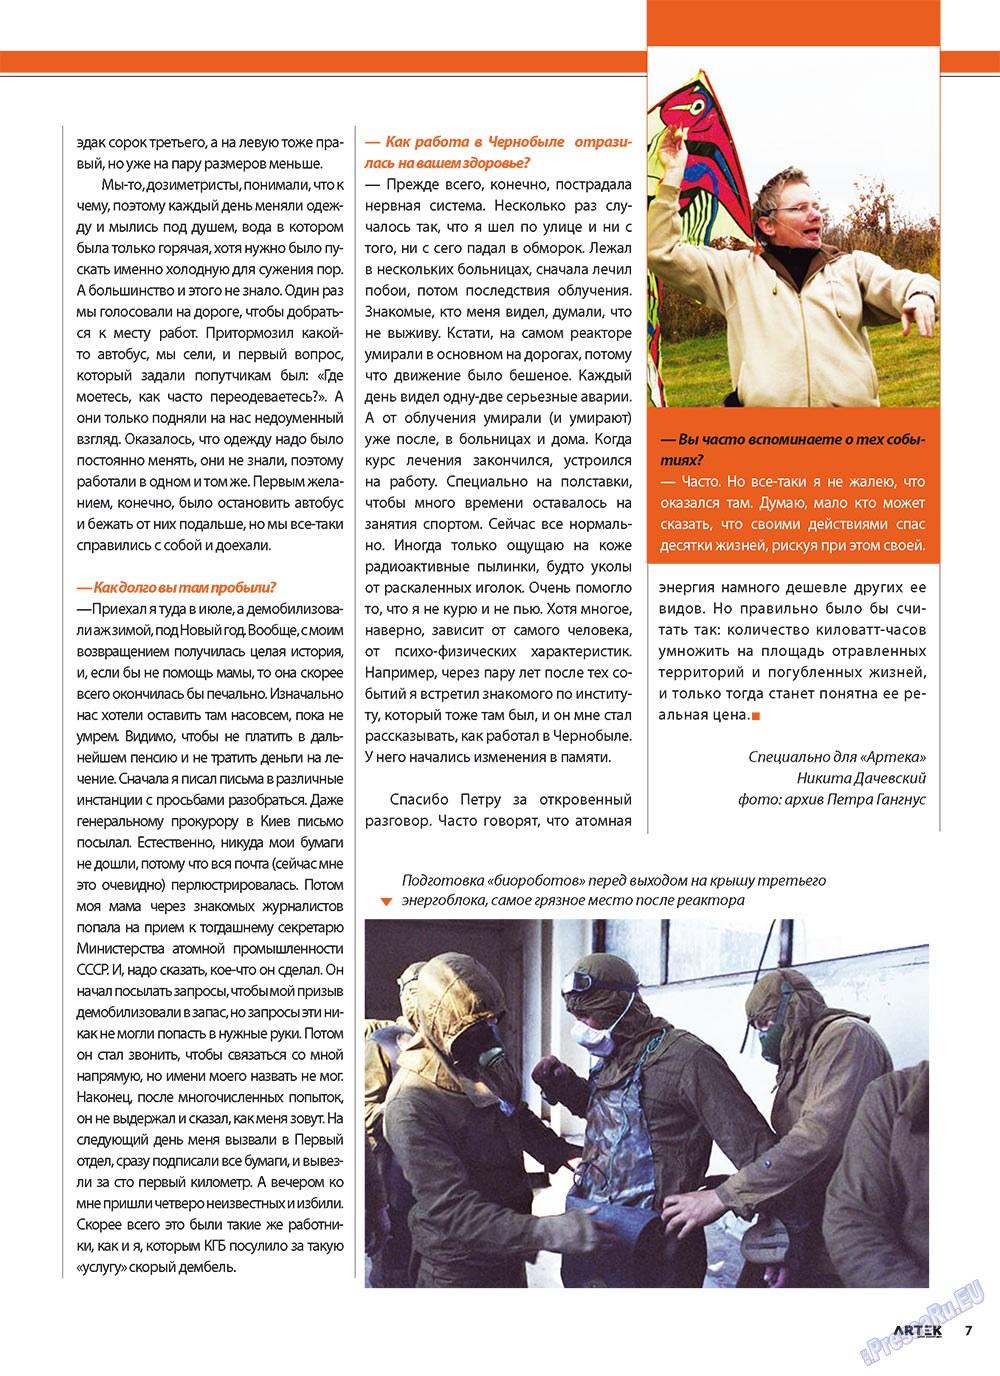 Артек (журнал). 2010 год, номер 2, стр. 9